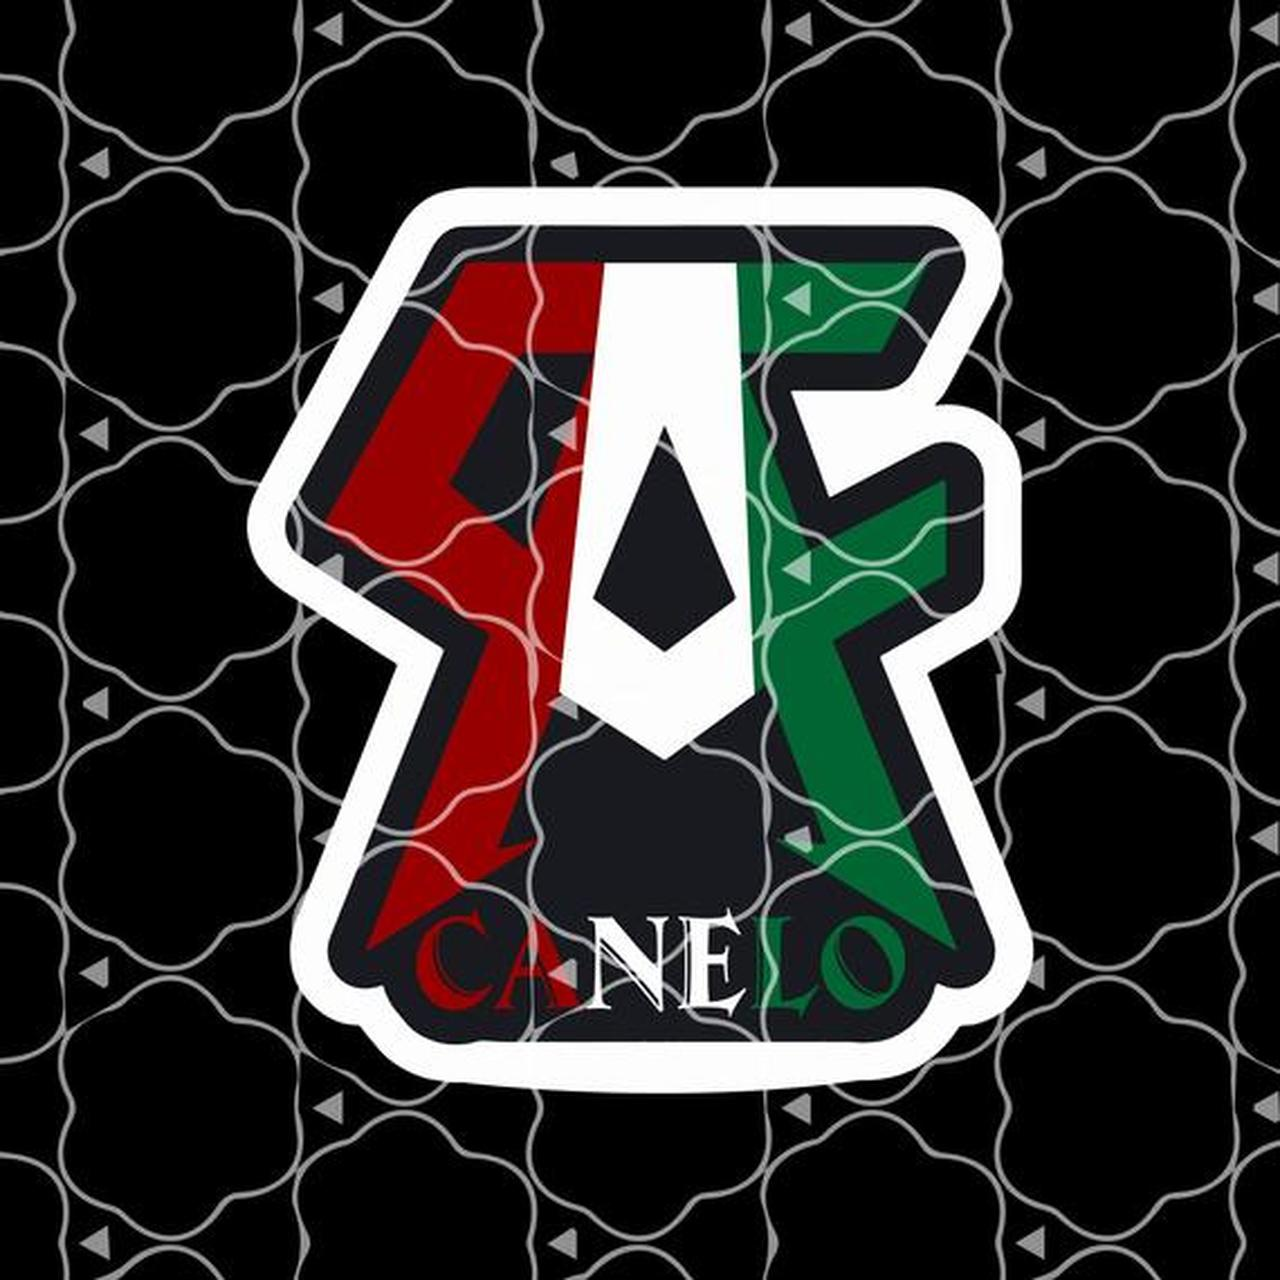 Canelo logo svg ,Team Canelo svg , Box Canelo, SVG, DxF, EPS.